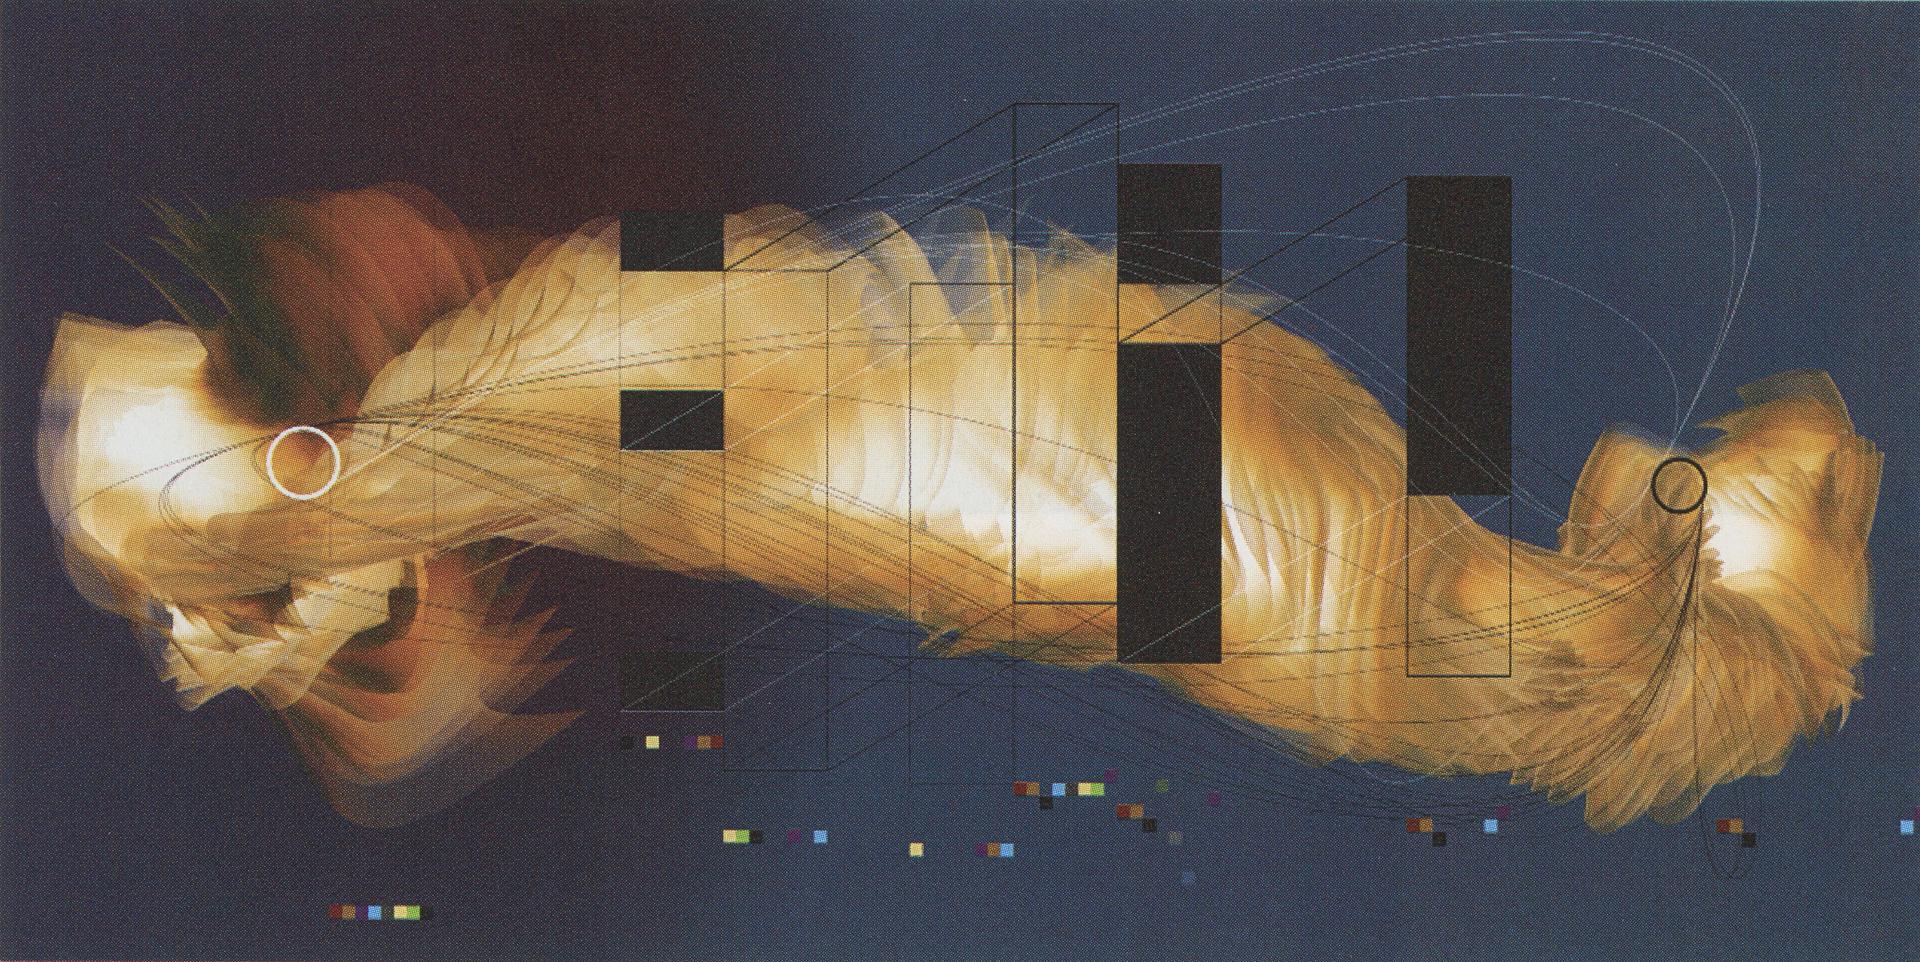 ©2002, Kent Oberheu